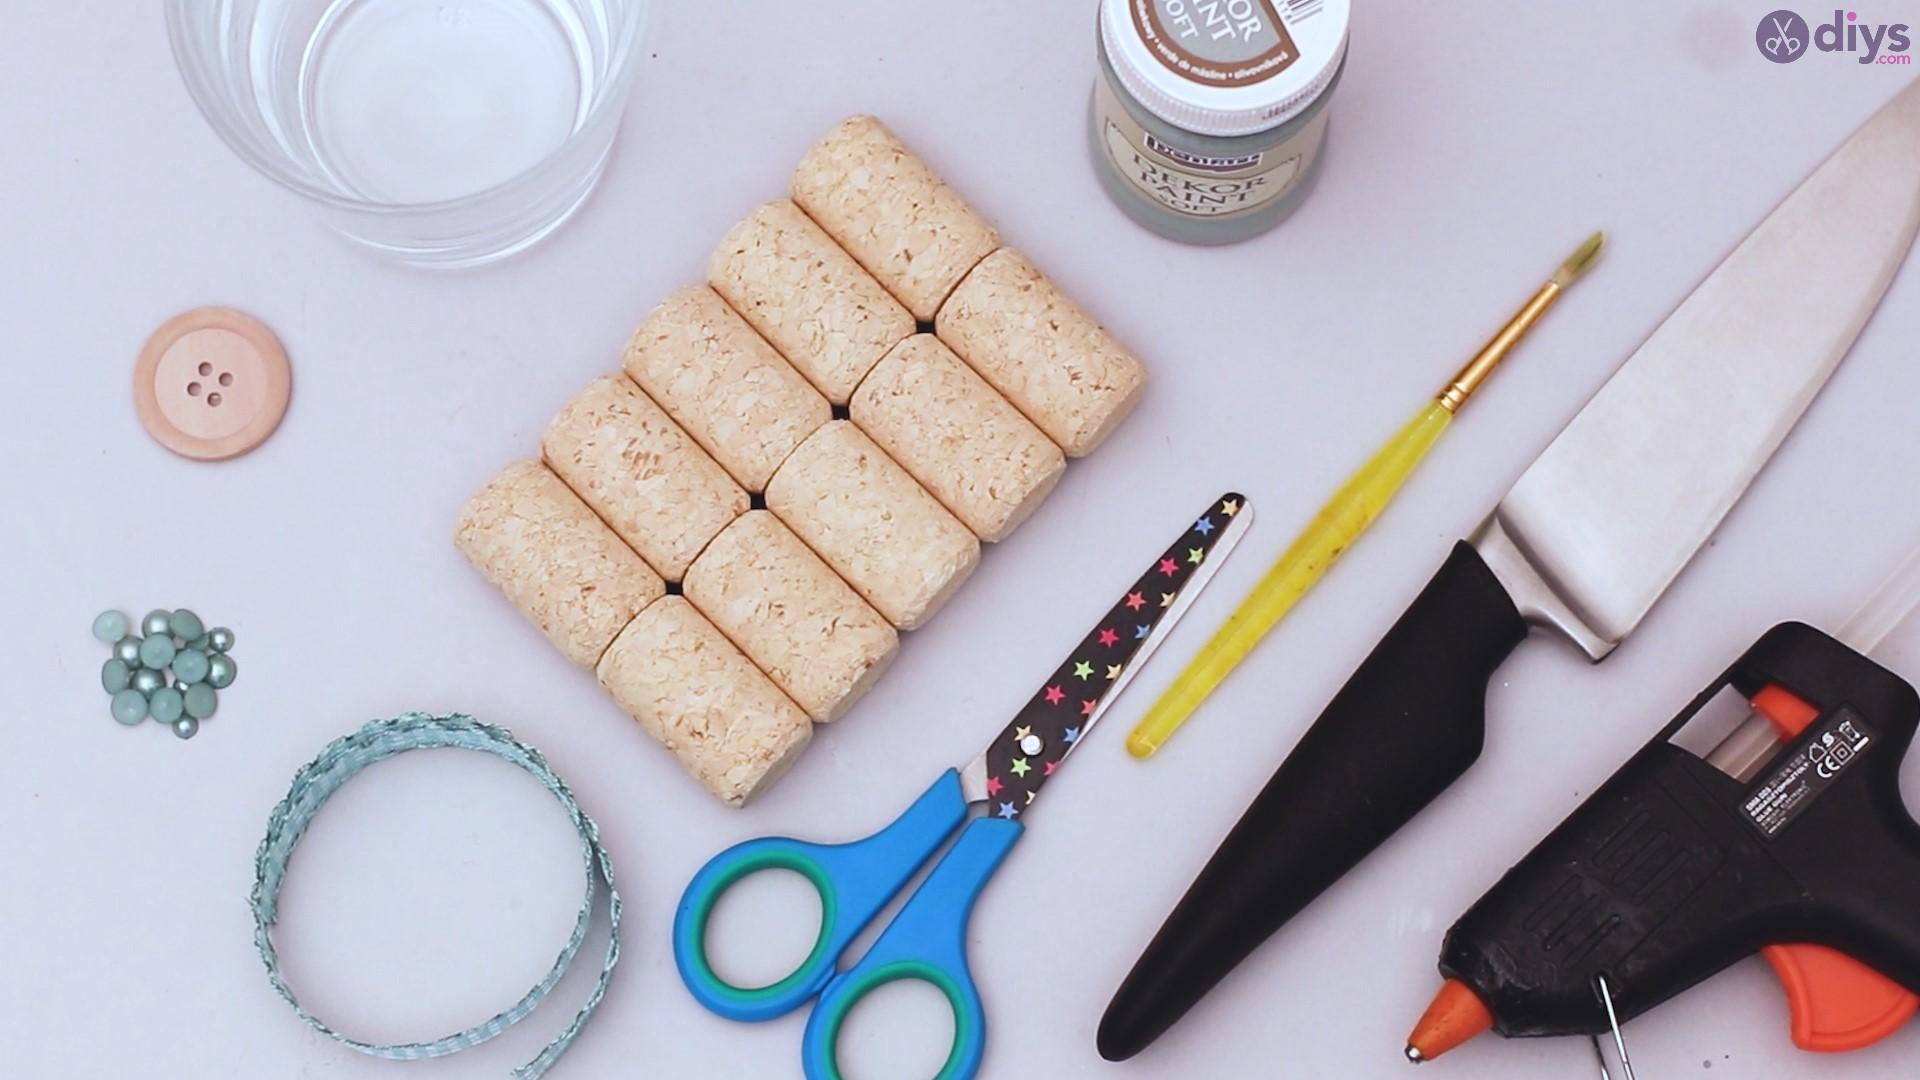 Diy wine cork candle holder materials